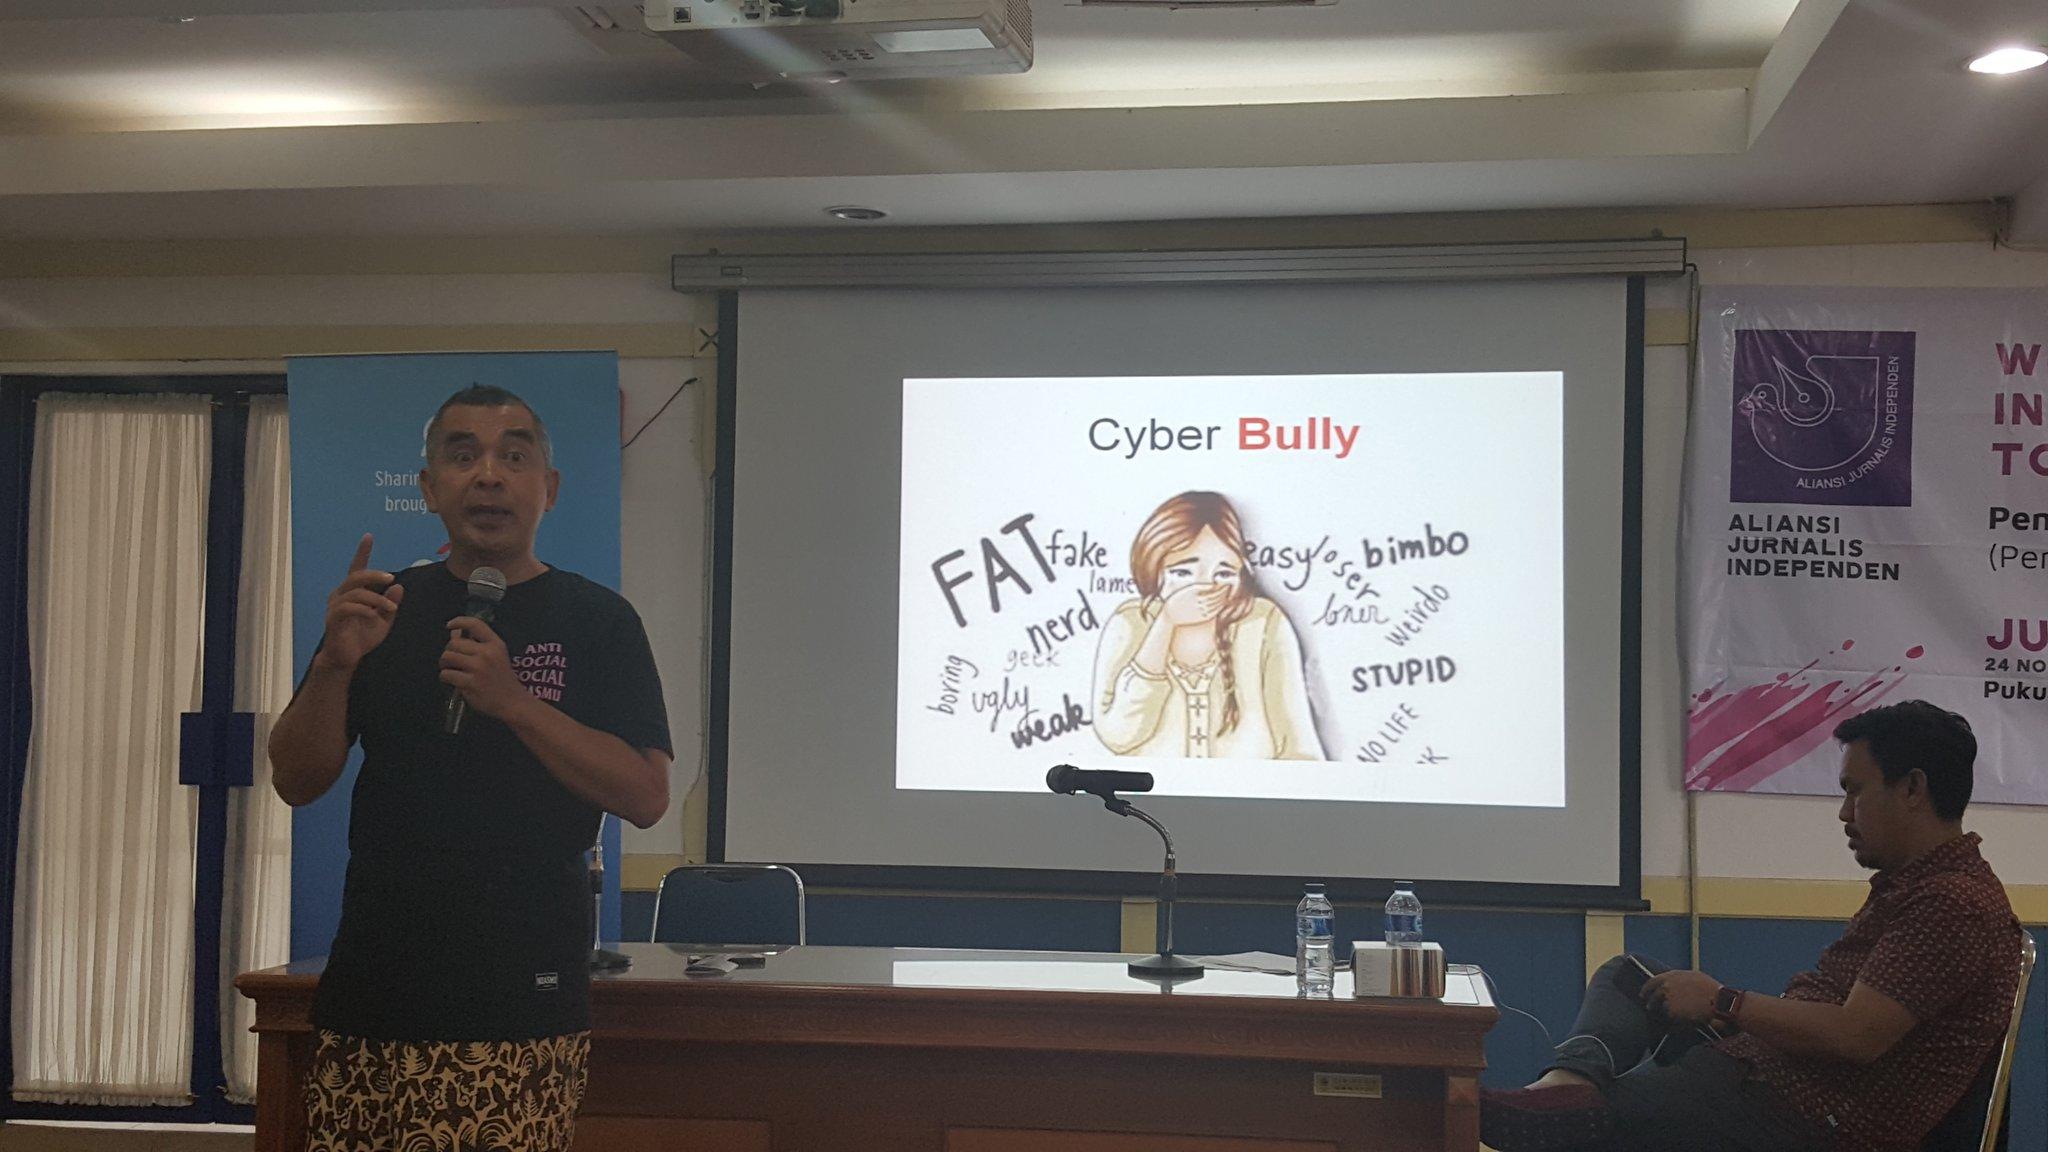 Salah satu bahaya internet bagi anak-anak: cyber bully #FesMed2017 https://t.co/GGkCfnDDQi